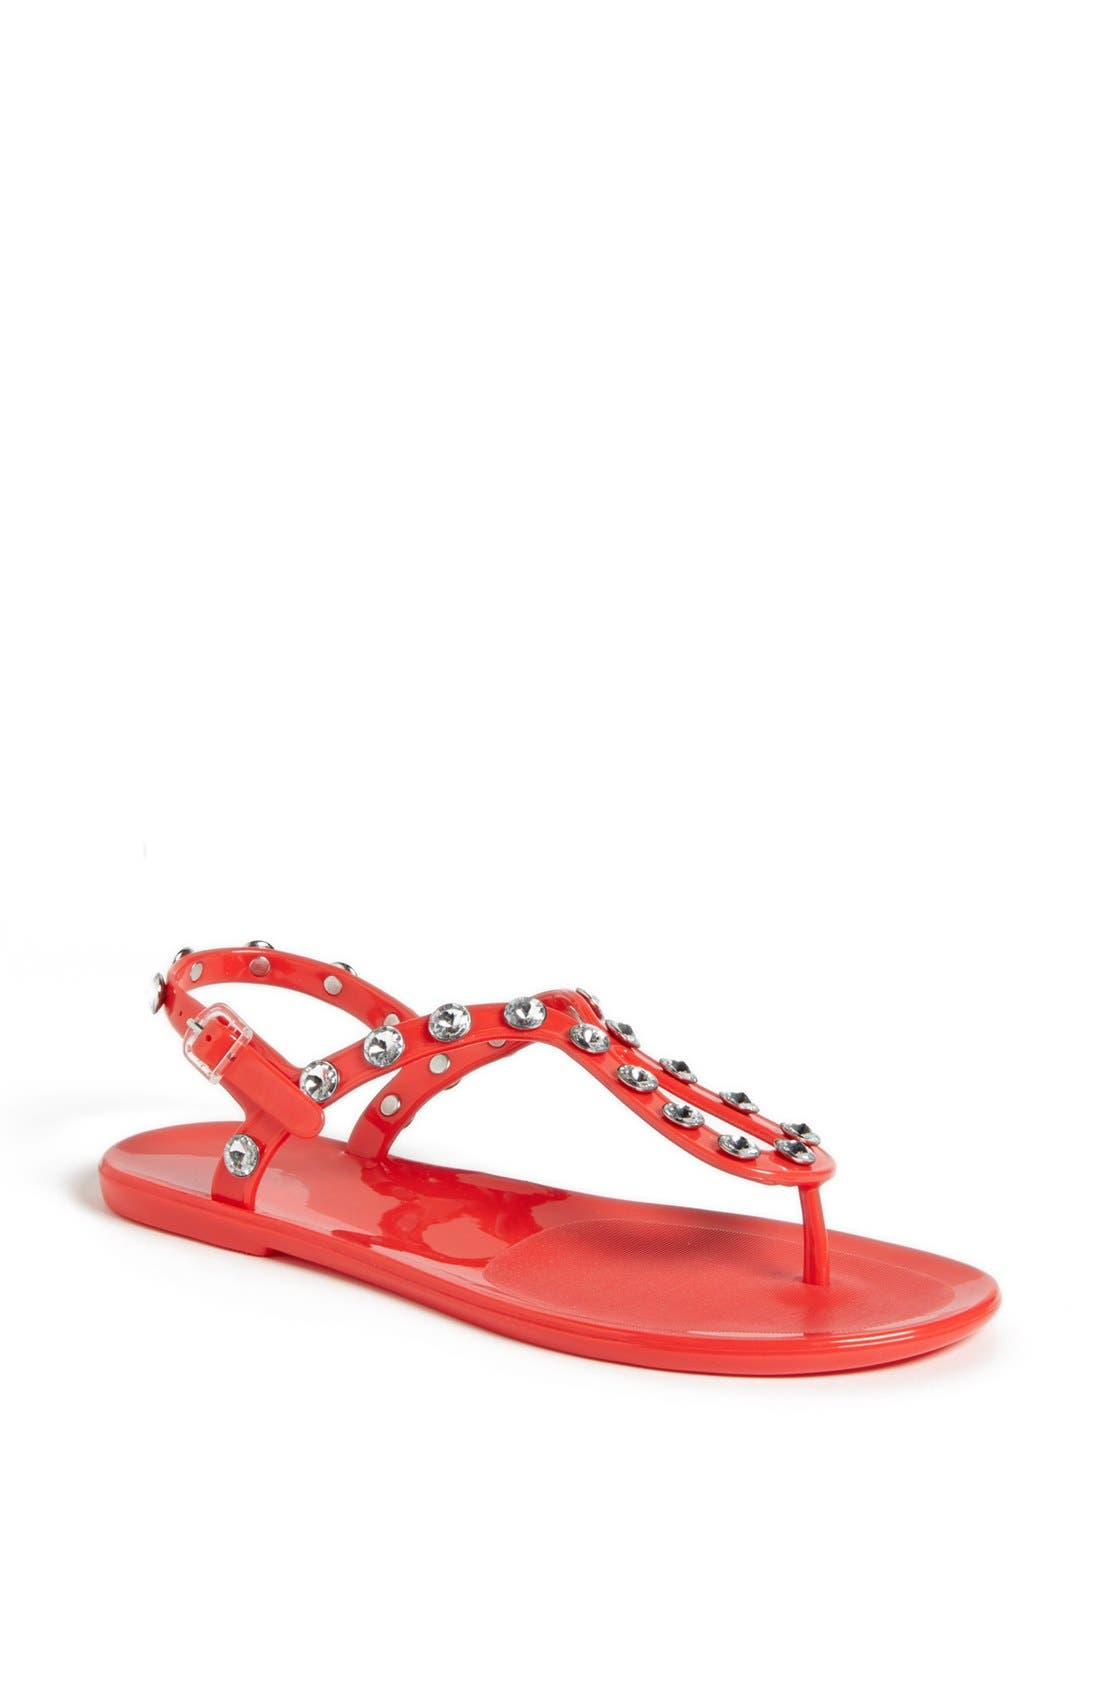 Alternate Image 1 Selected - Holster Fashion 'Supermodel' Jelly Thong Sandal